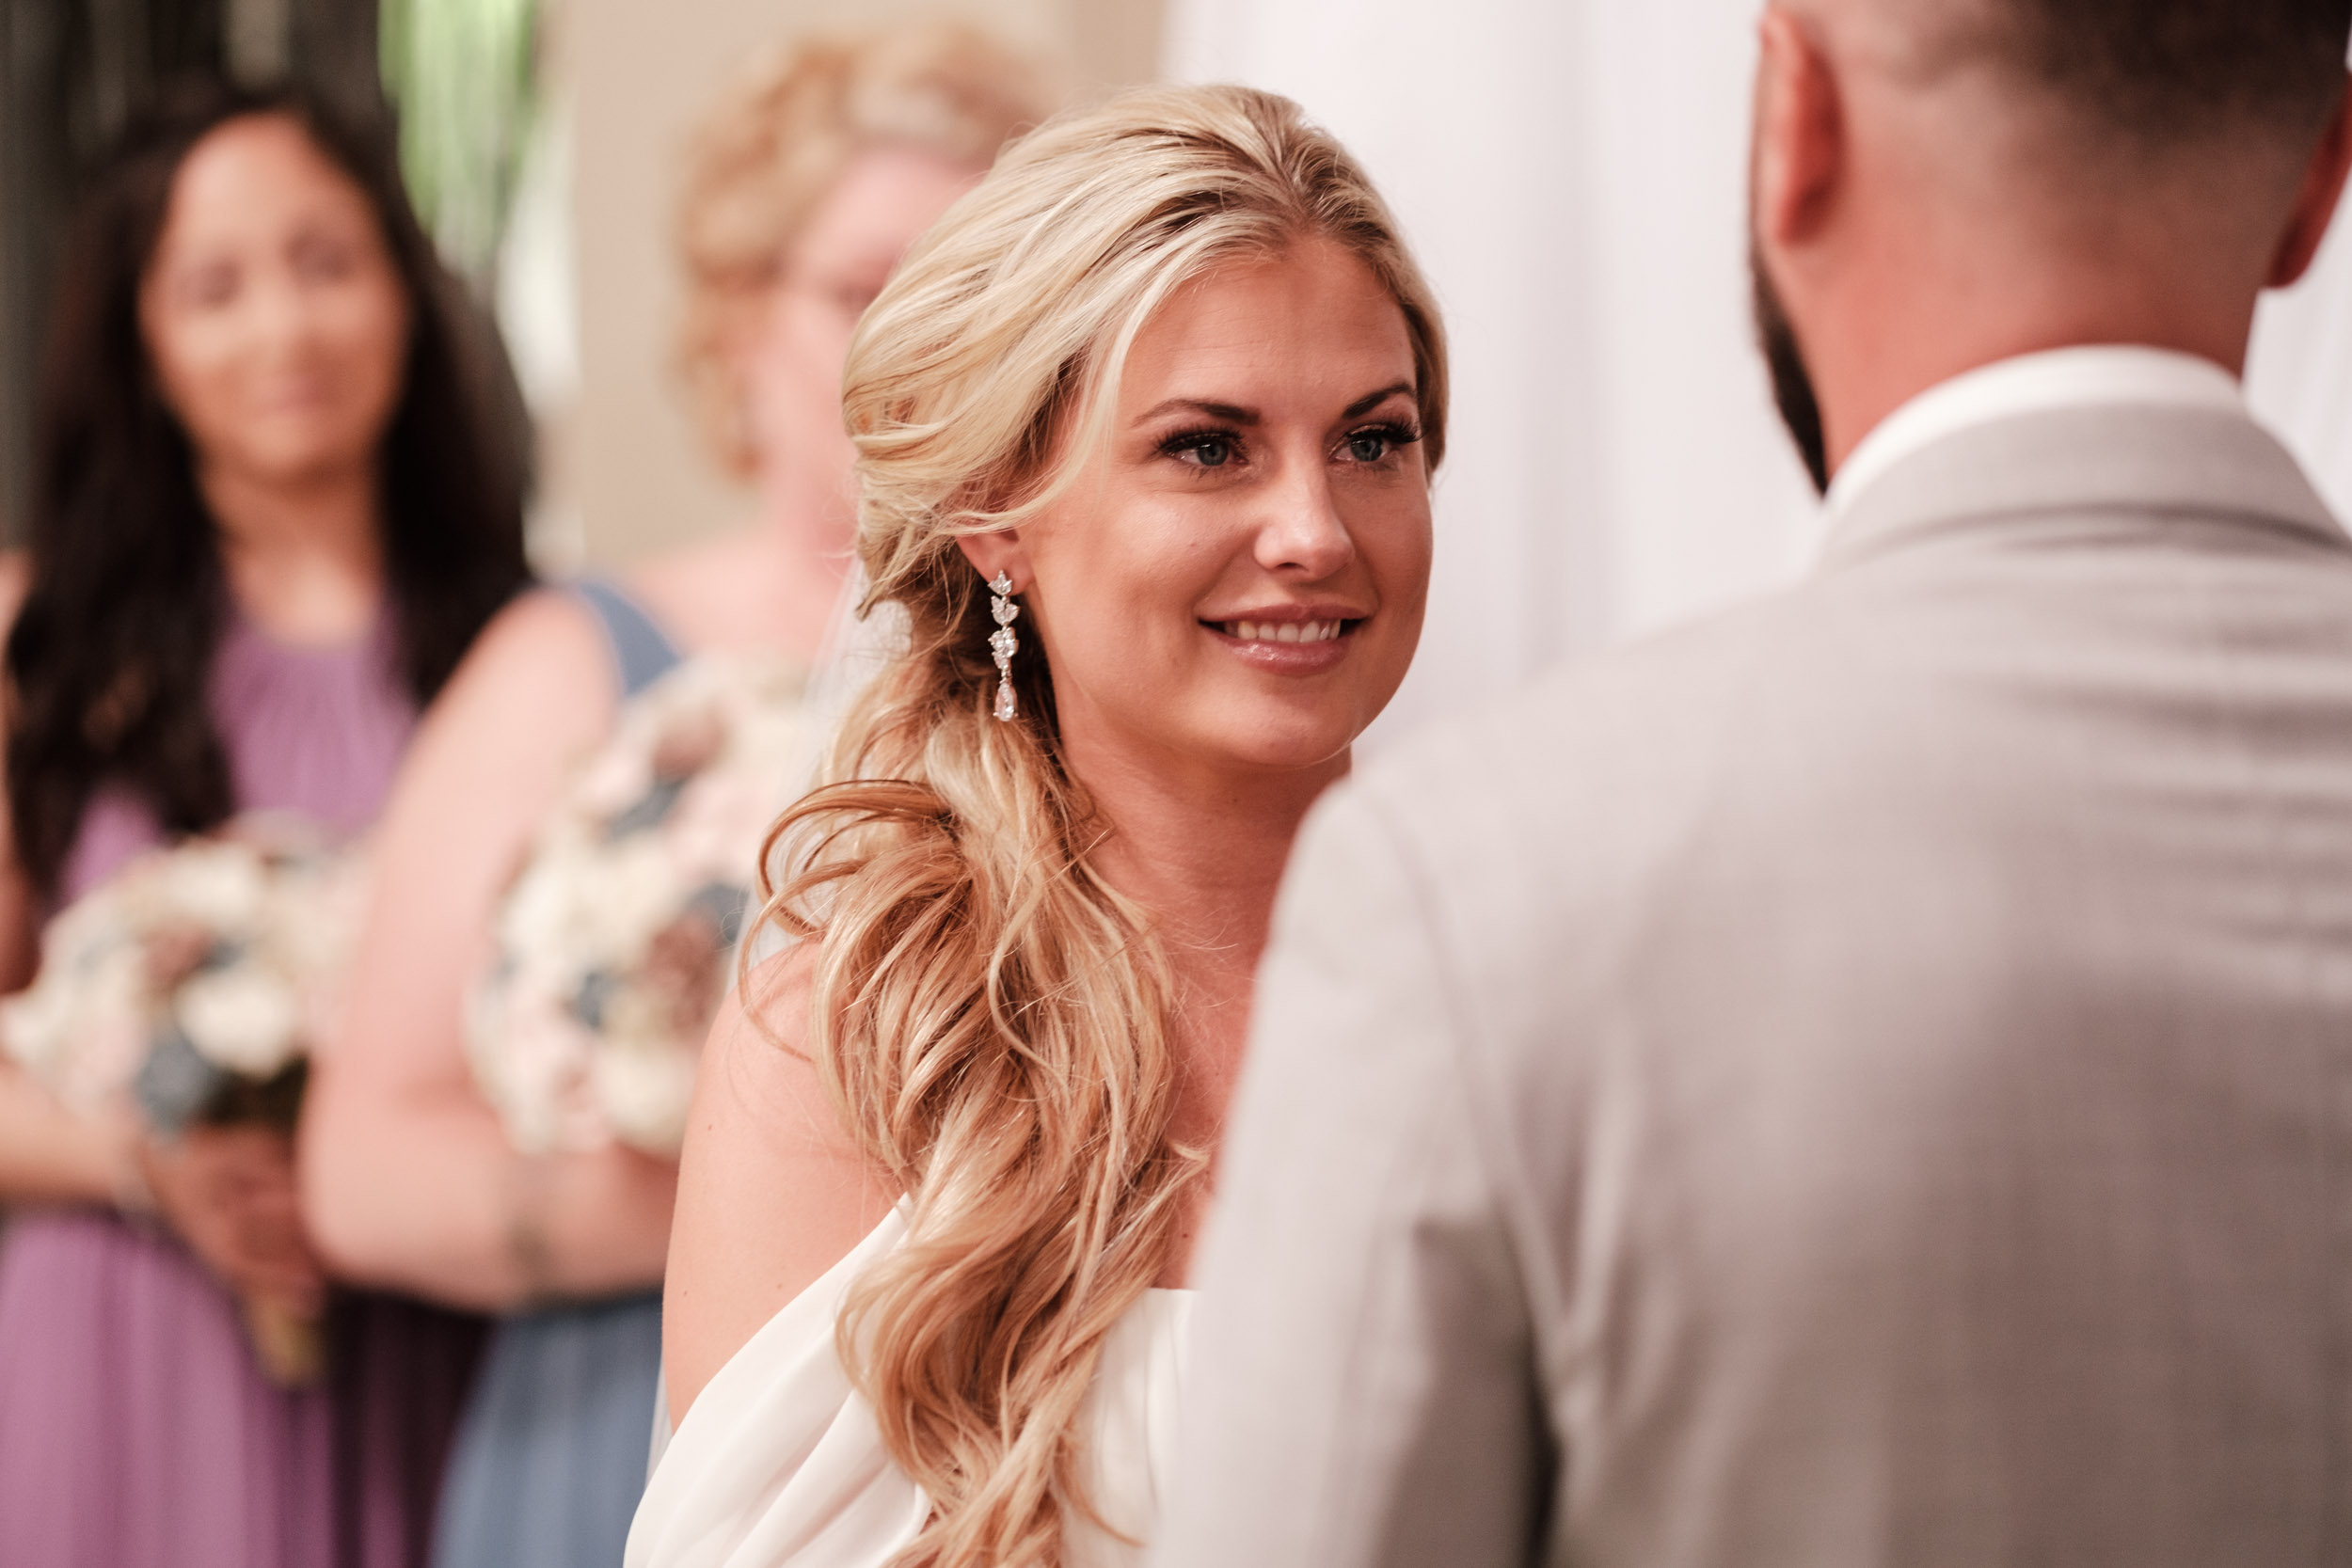 19-06-01 Megan Josh - Nicholas Conservatory Wedding-17.jpg